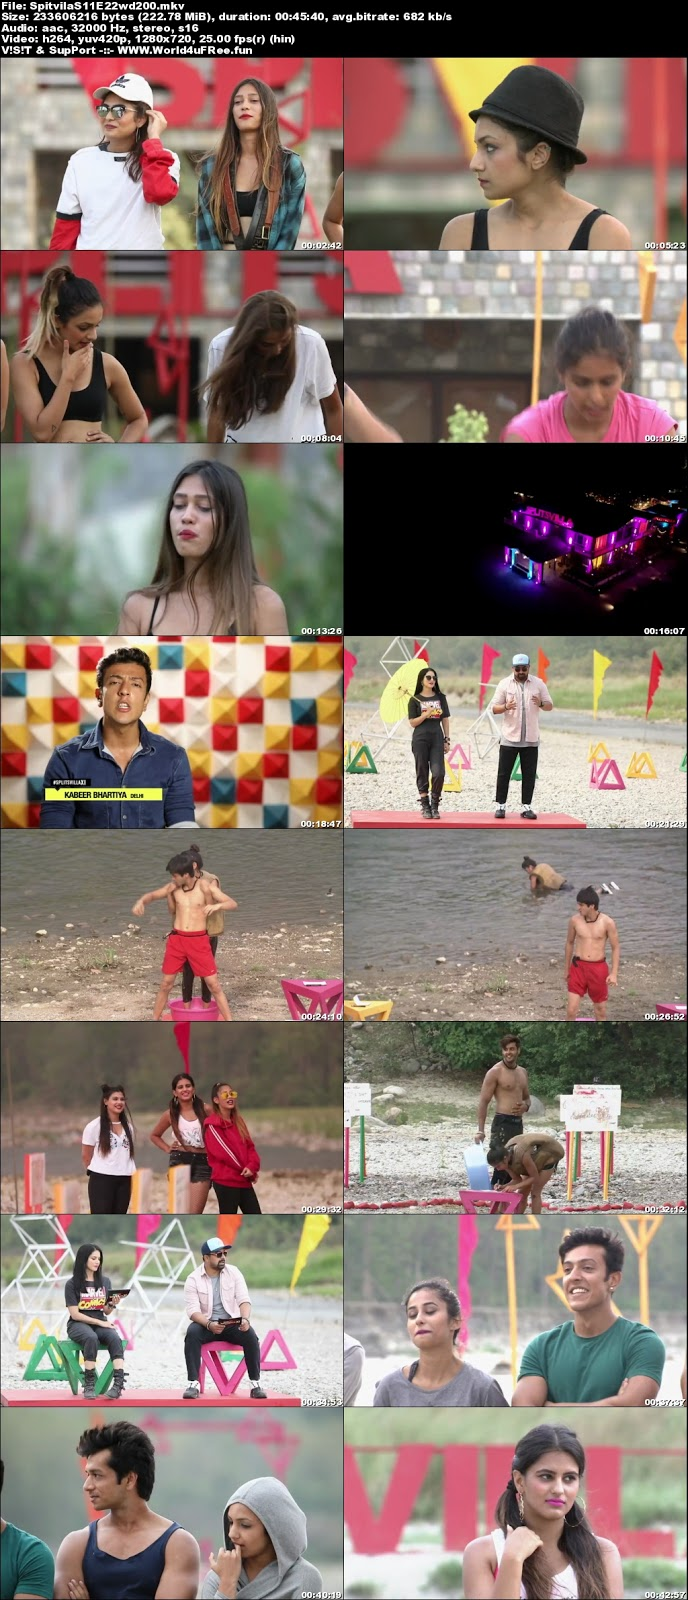 Splitsvilla Hindi Season 11 Episode 22 720p WEBRip 200mb x264